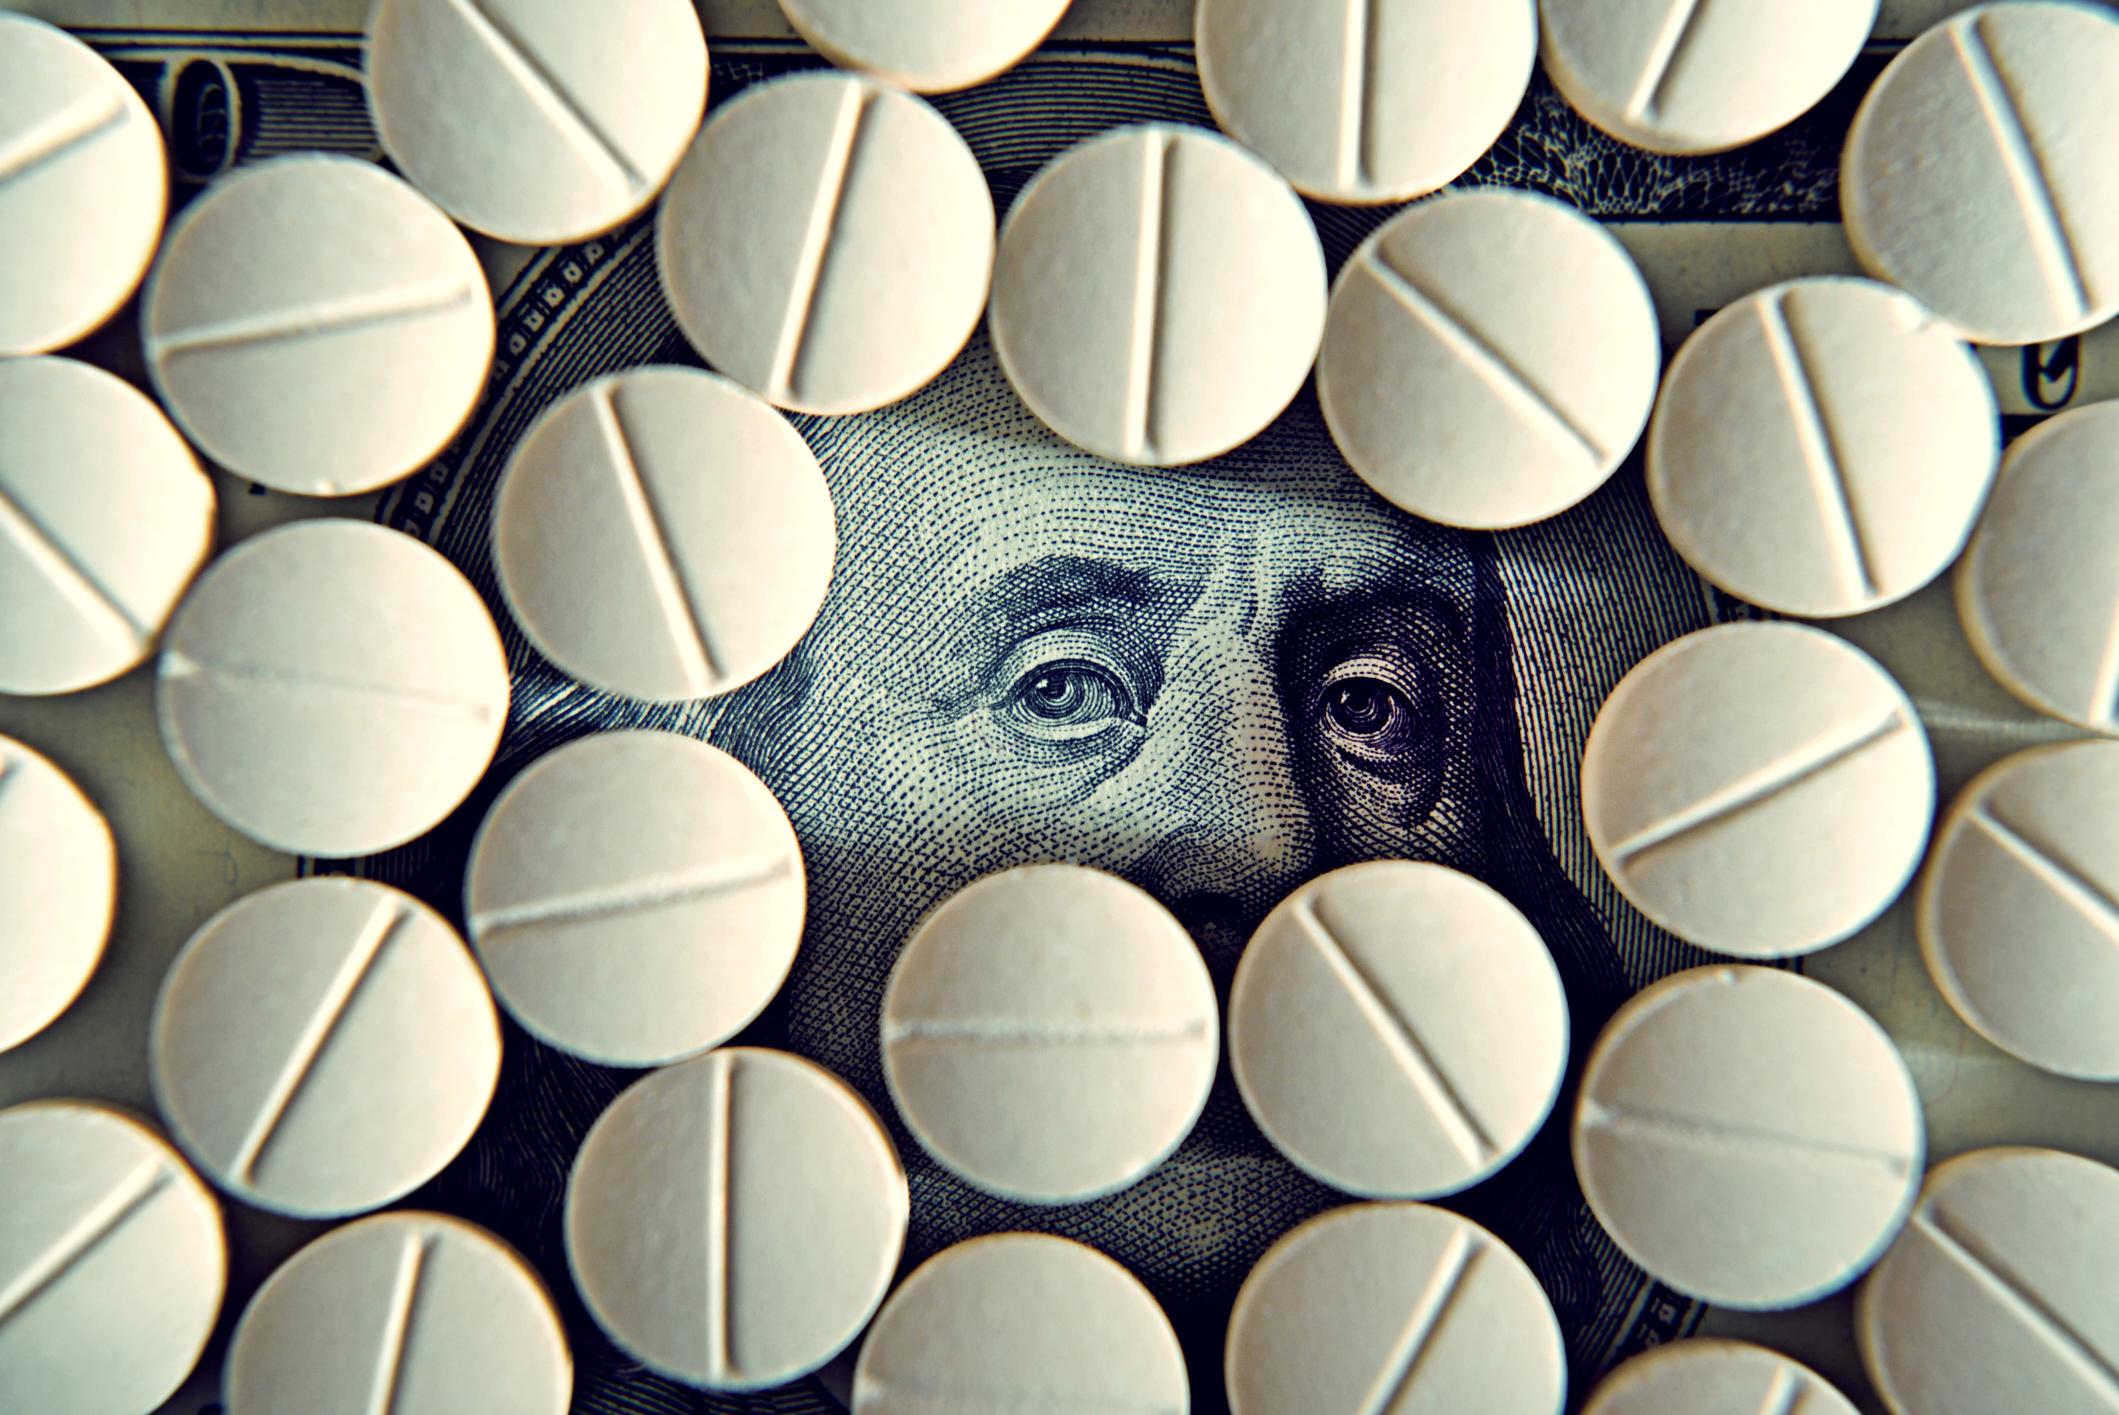 Ben Franklin's face on a hundred-dollar bill poking through a pile of pills